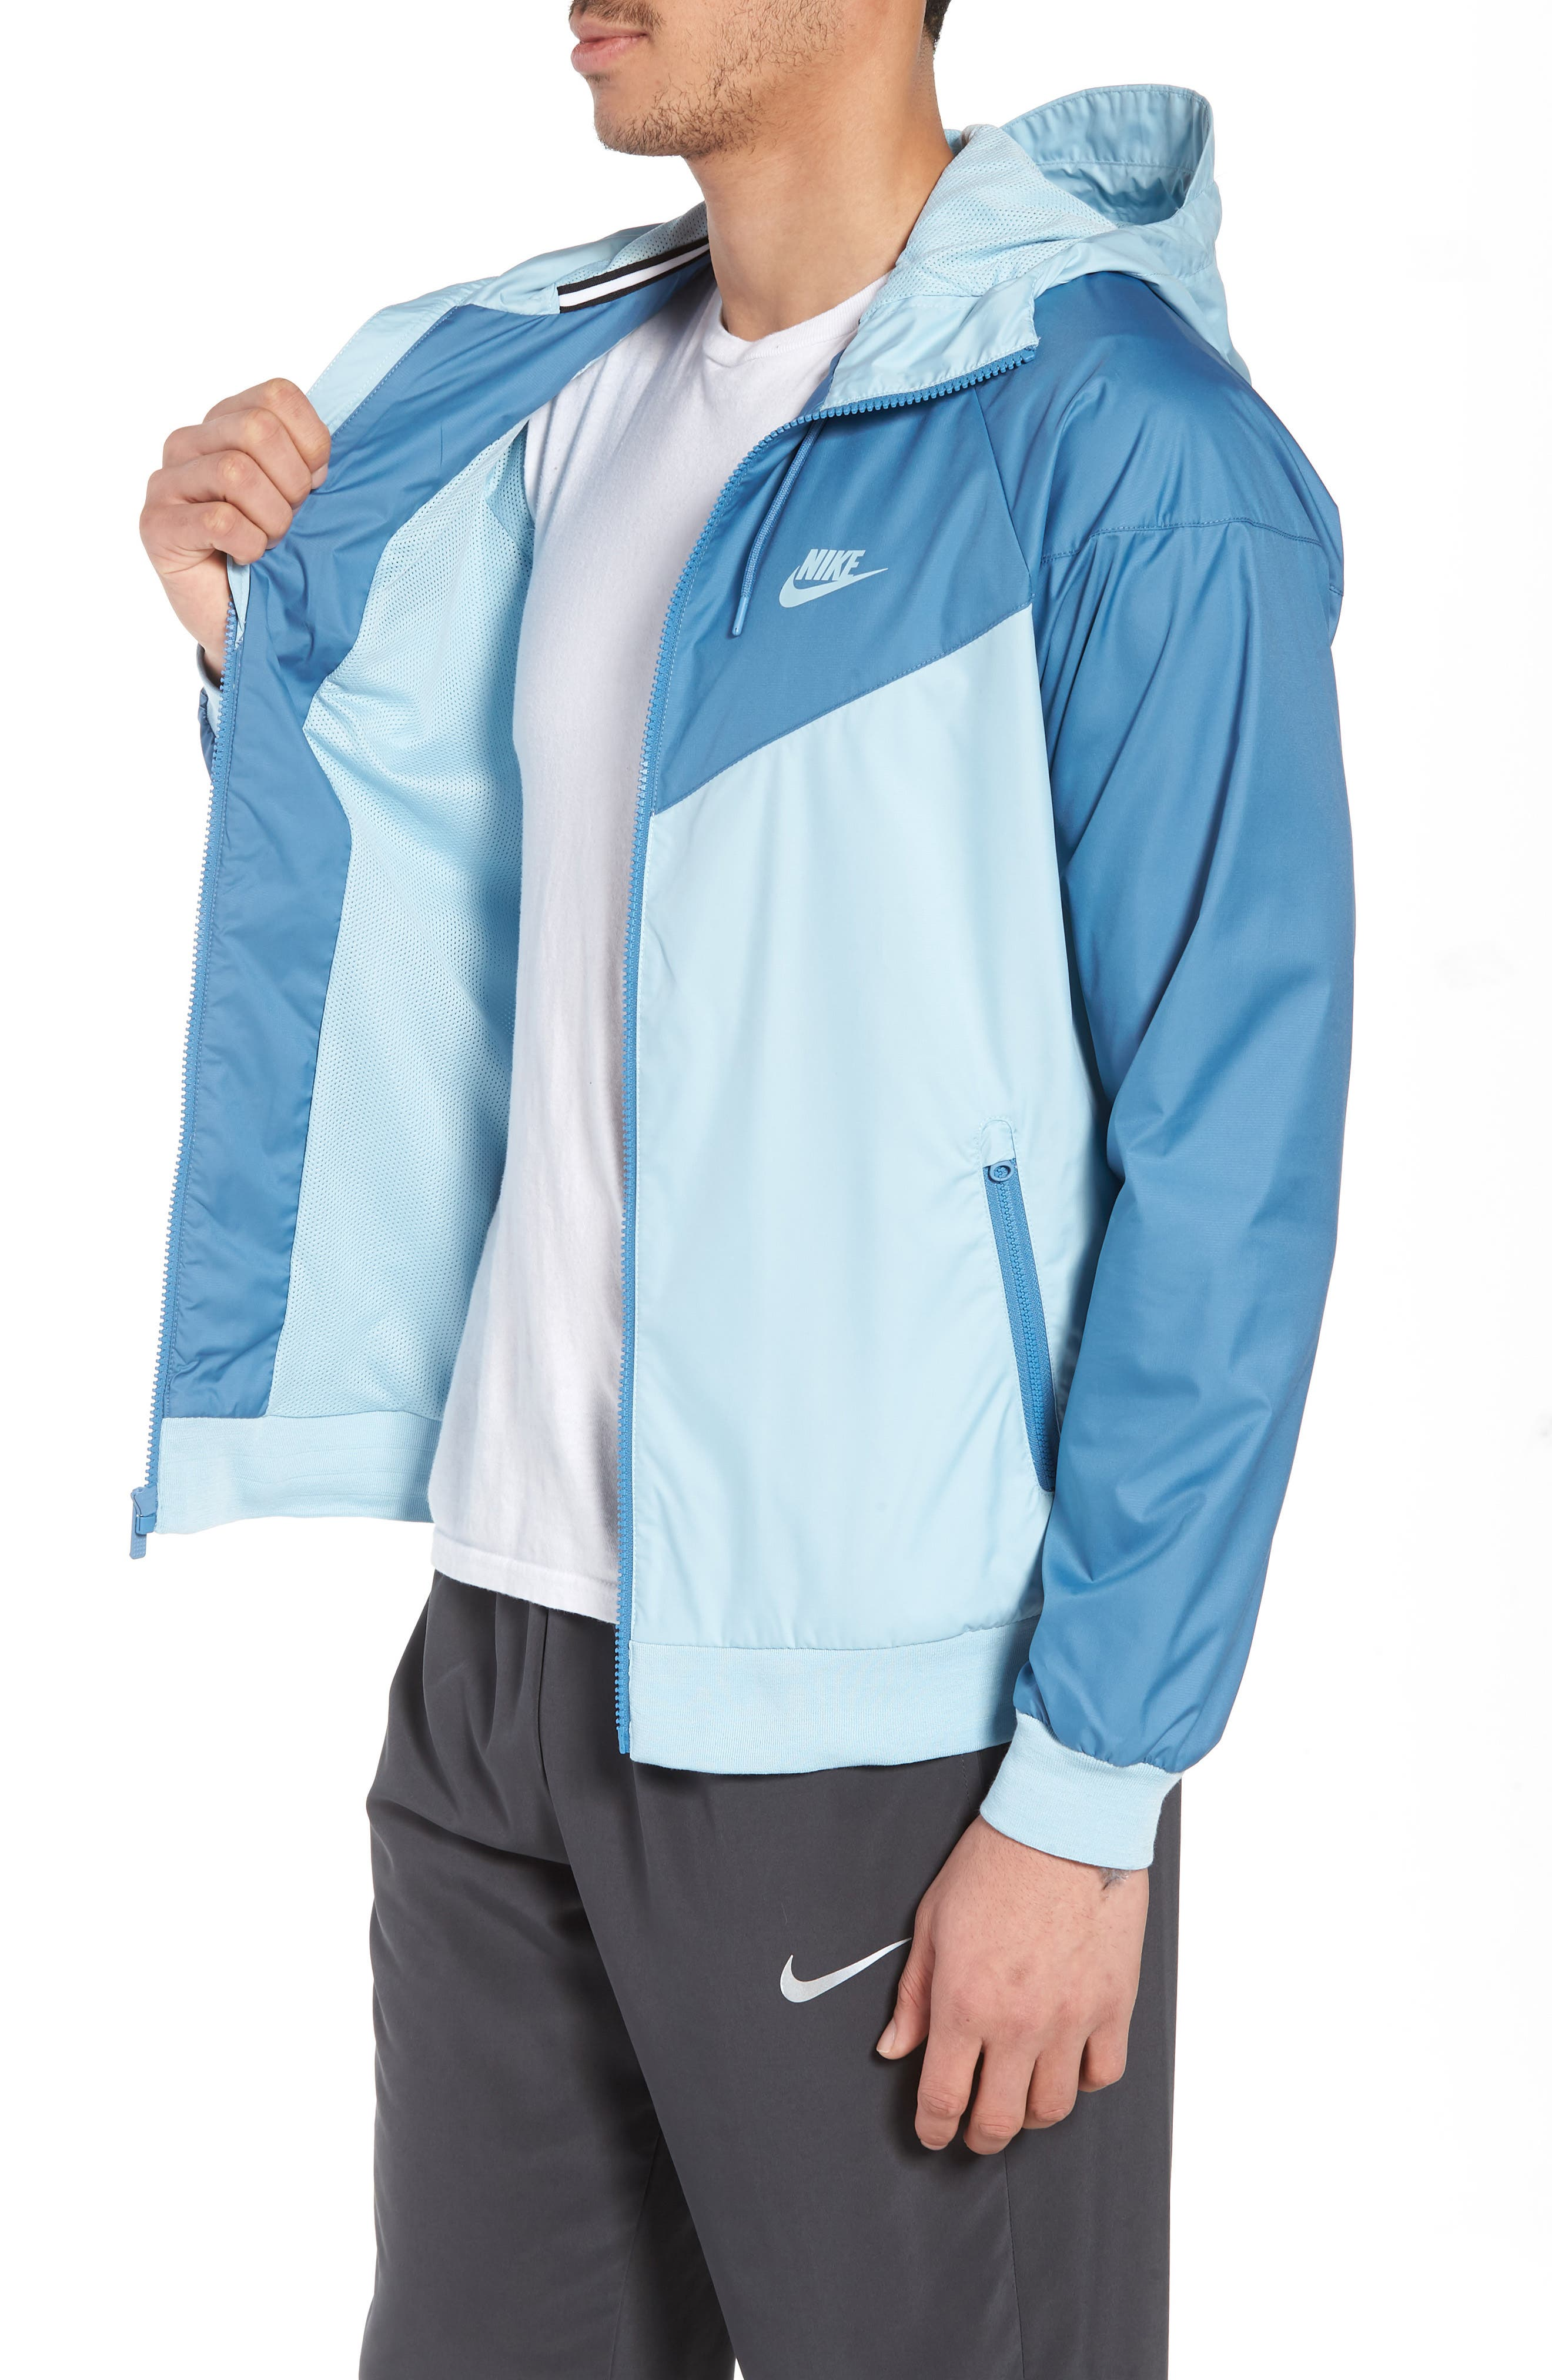 NIKE,                             Windrunner Colorblock Jacket,                             Alternate thumbnail 3, color,                             OCEAN BLISS/ AEGEAN STORM